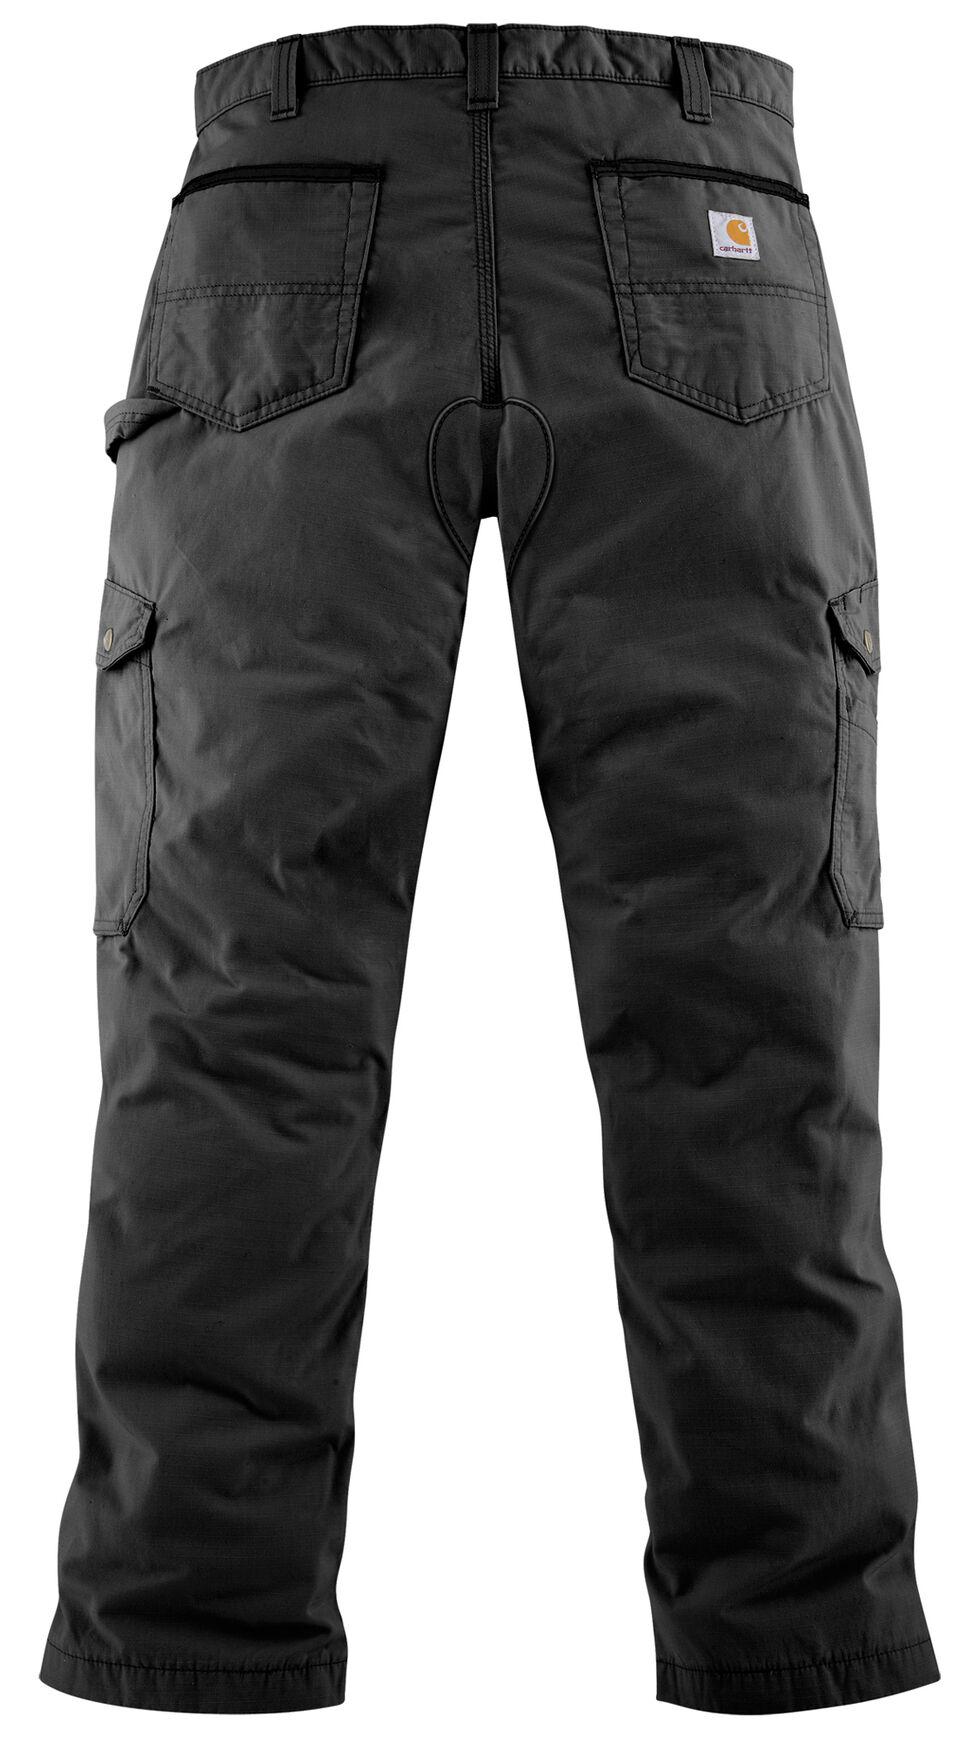 Carhartt Ripstop Cargo Work Pants, Black, hi-res